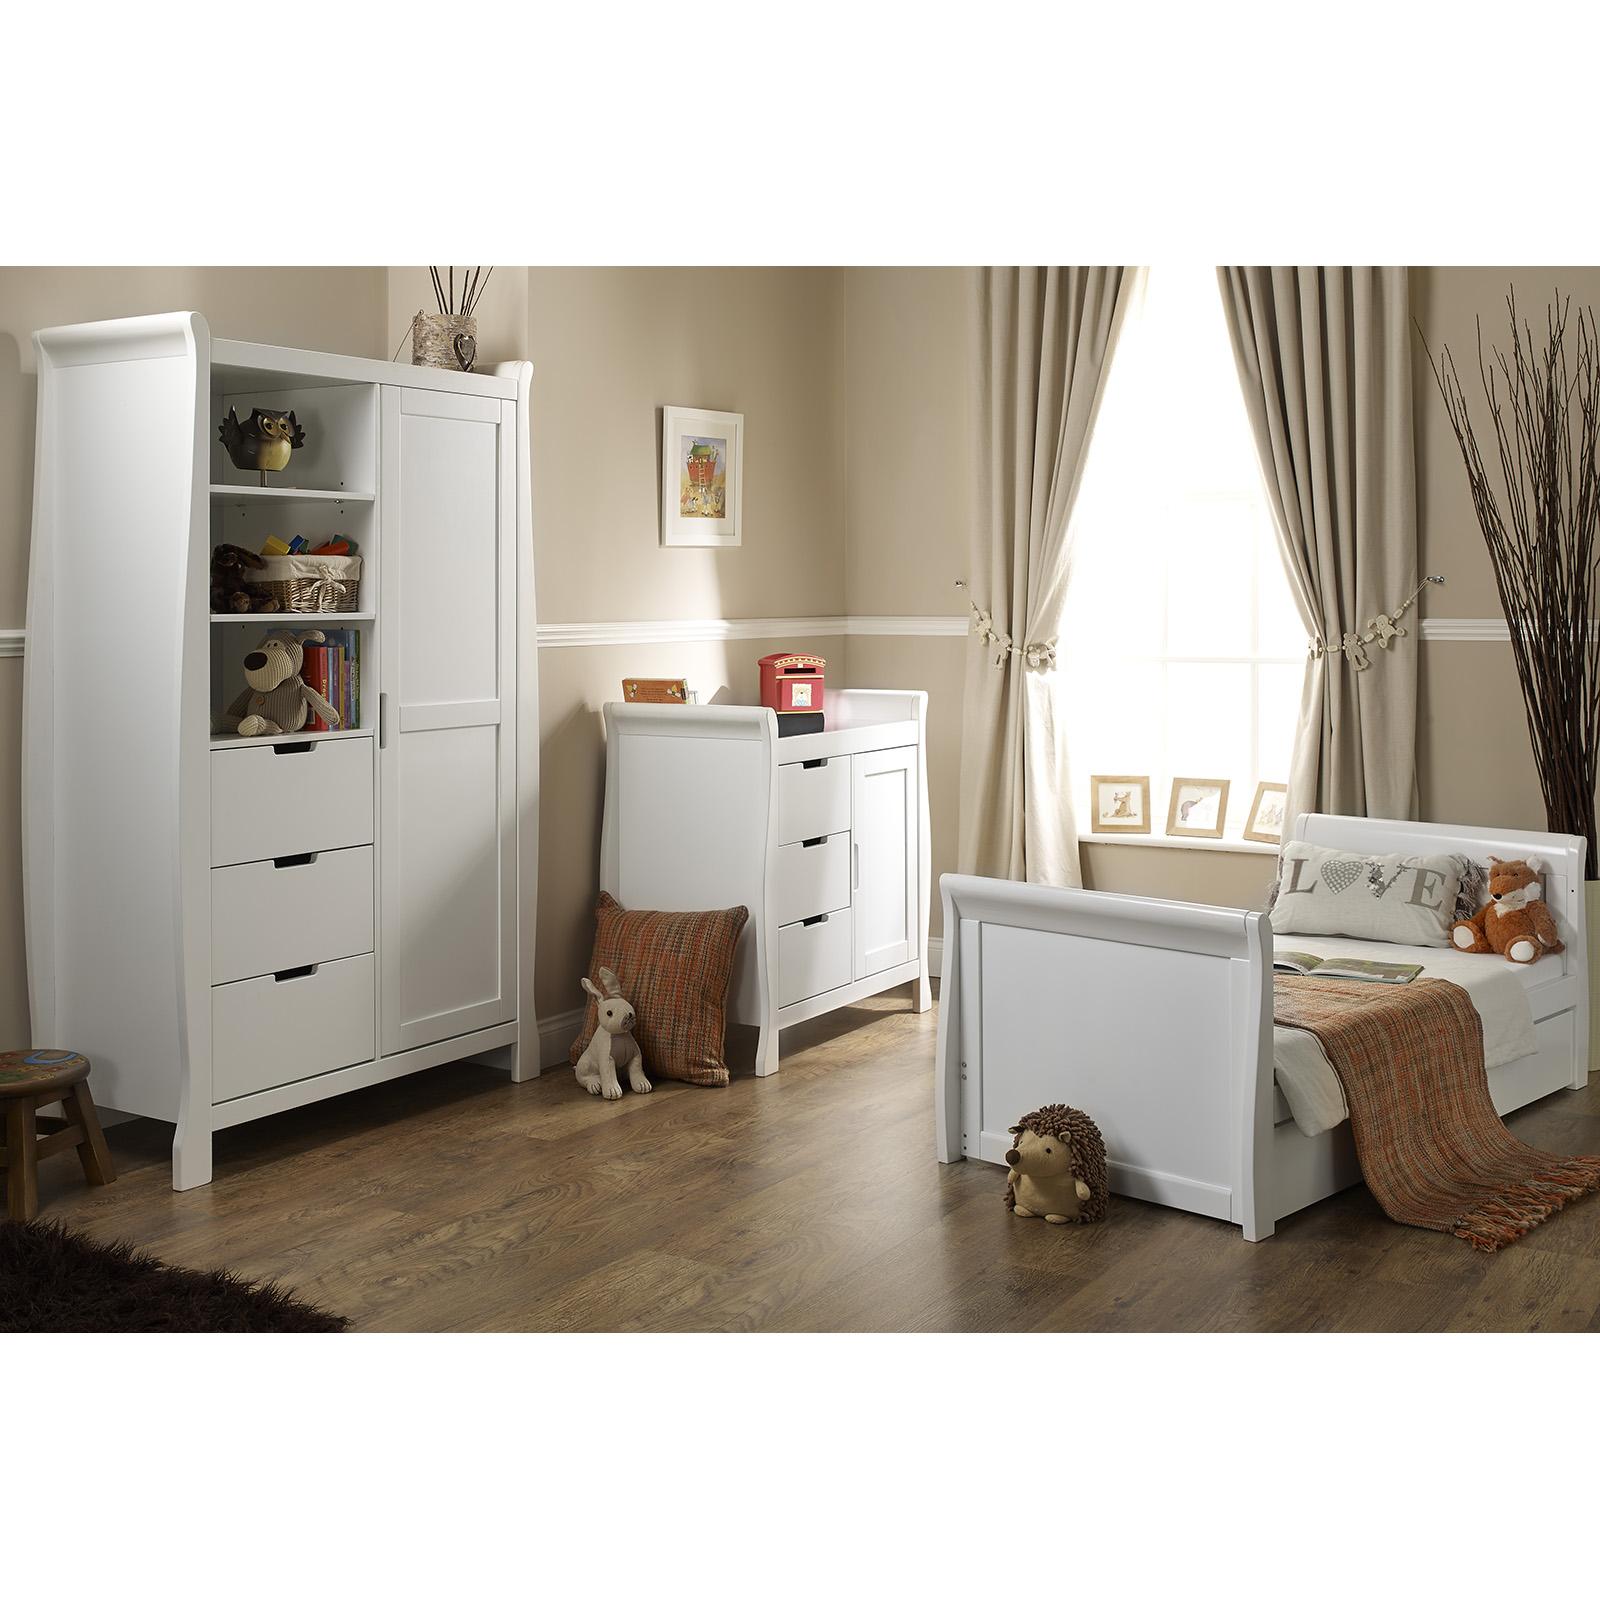 Sleigh Beds At Argos : Obaby stamford sleigh piece room set white buy at